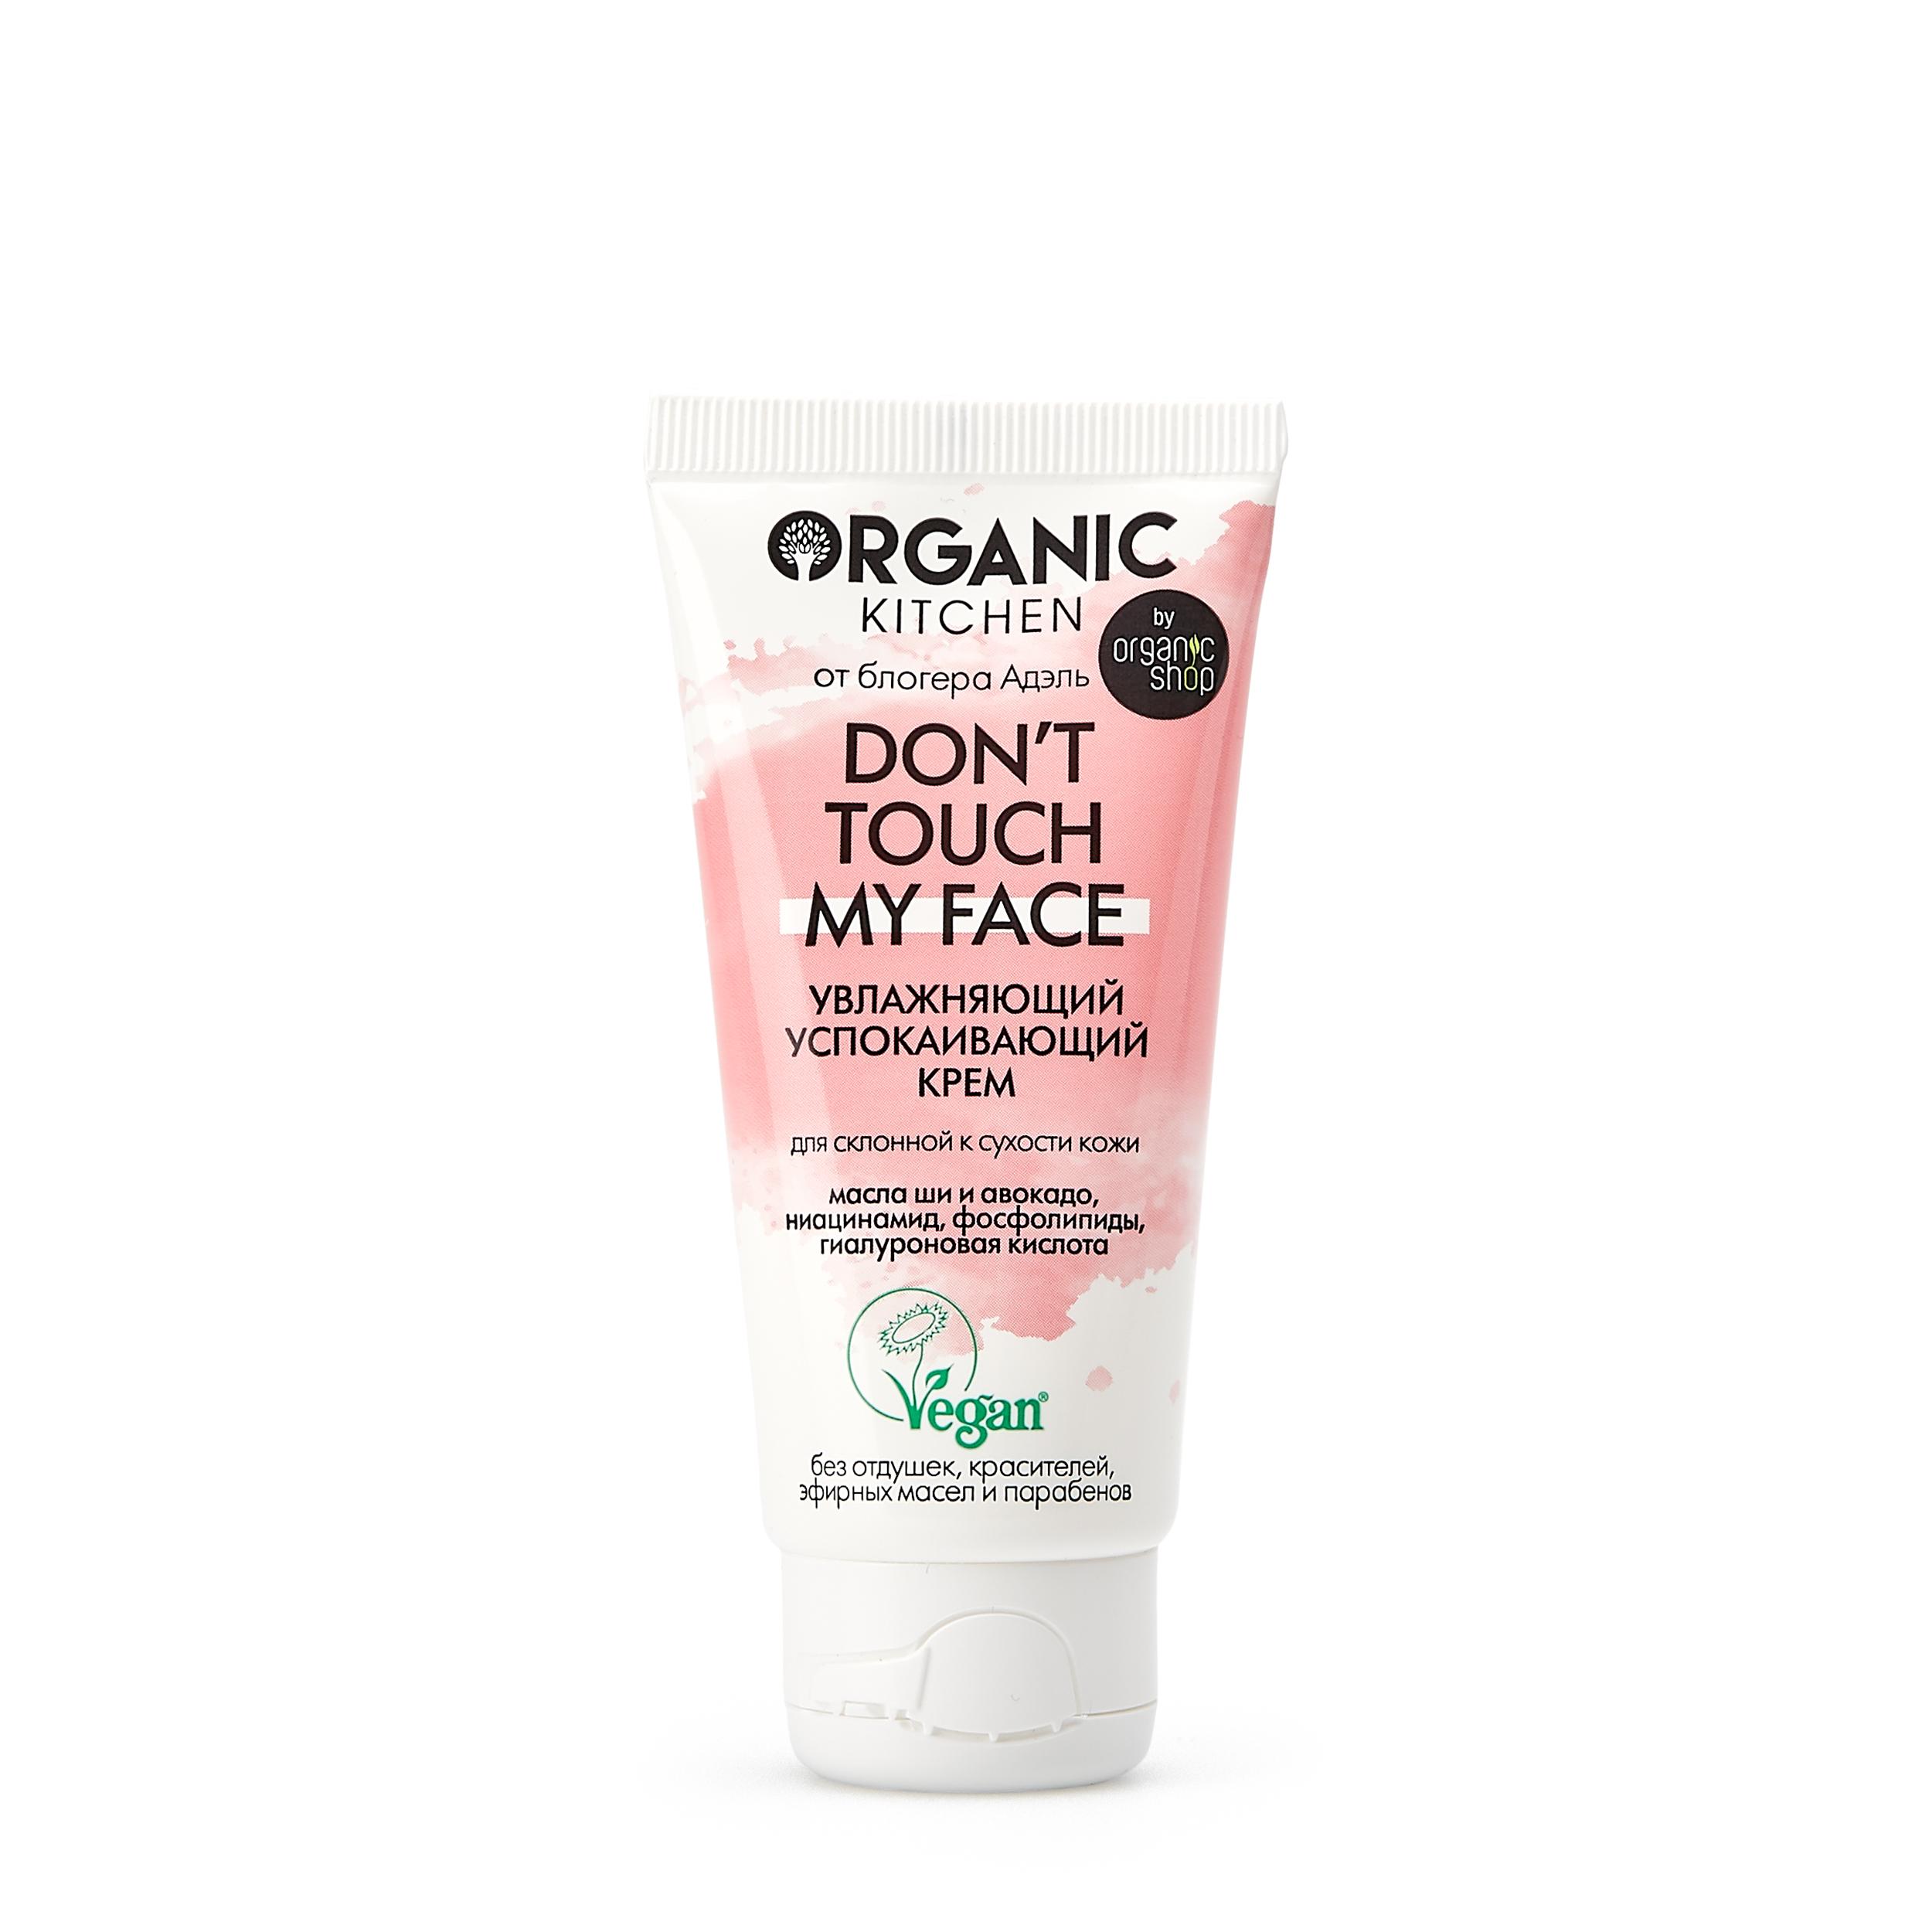 Organic Kitchen Увлажняющий успокаивающий крем «Don't touch my face»  - Купить